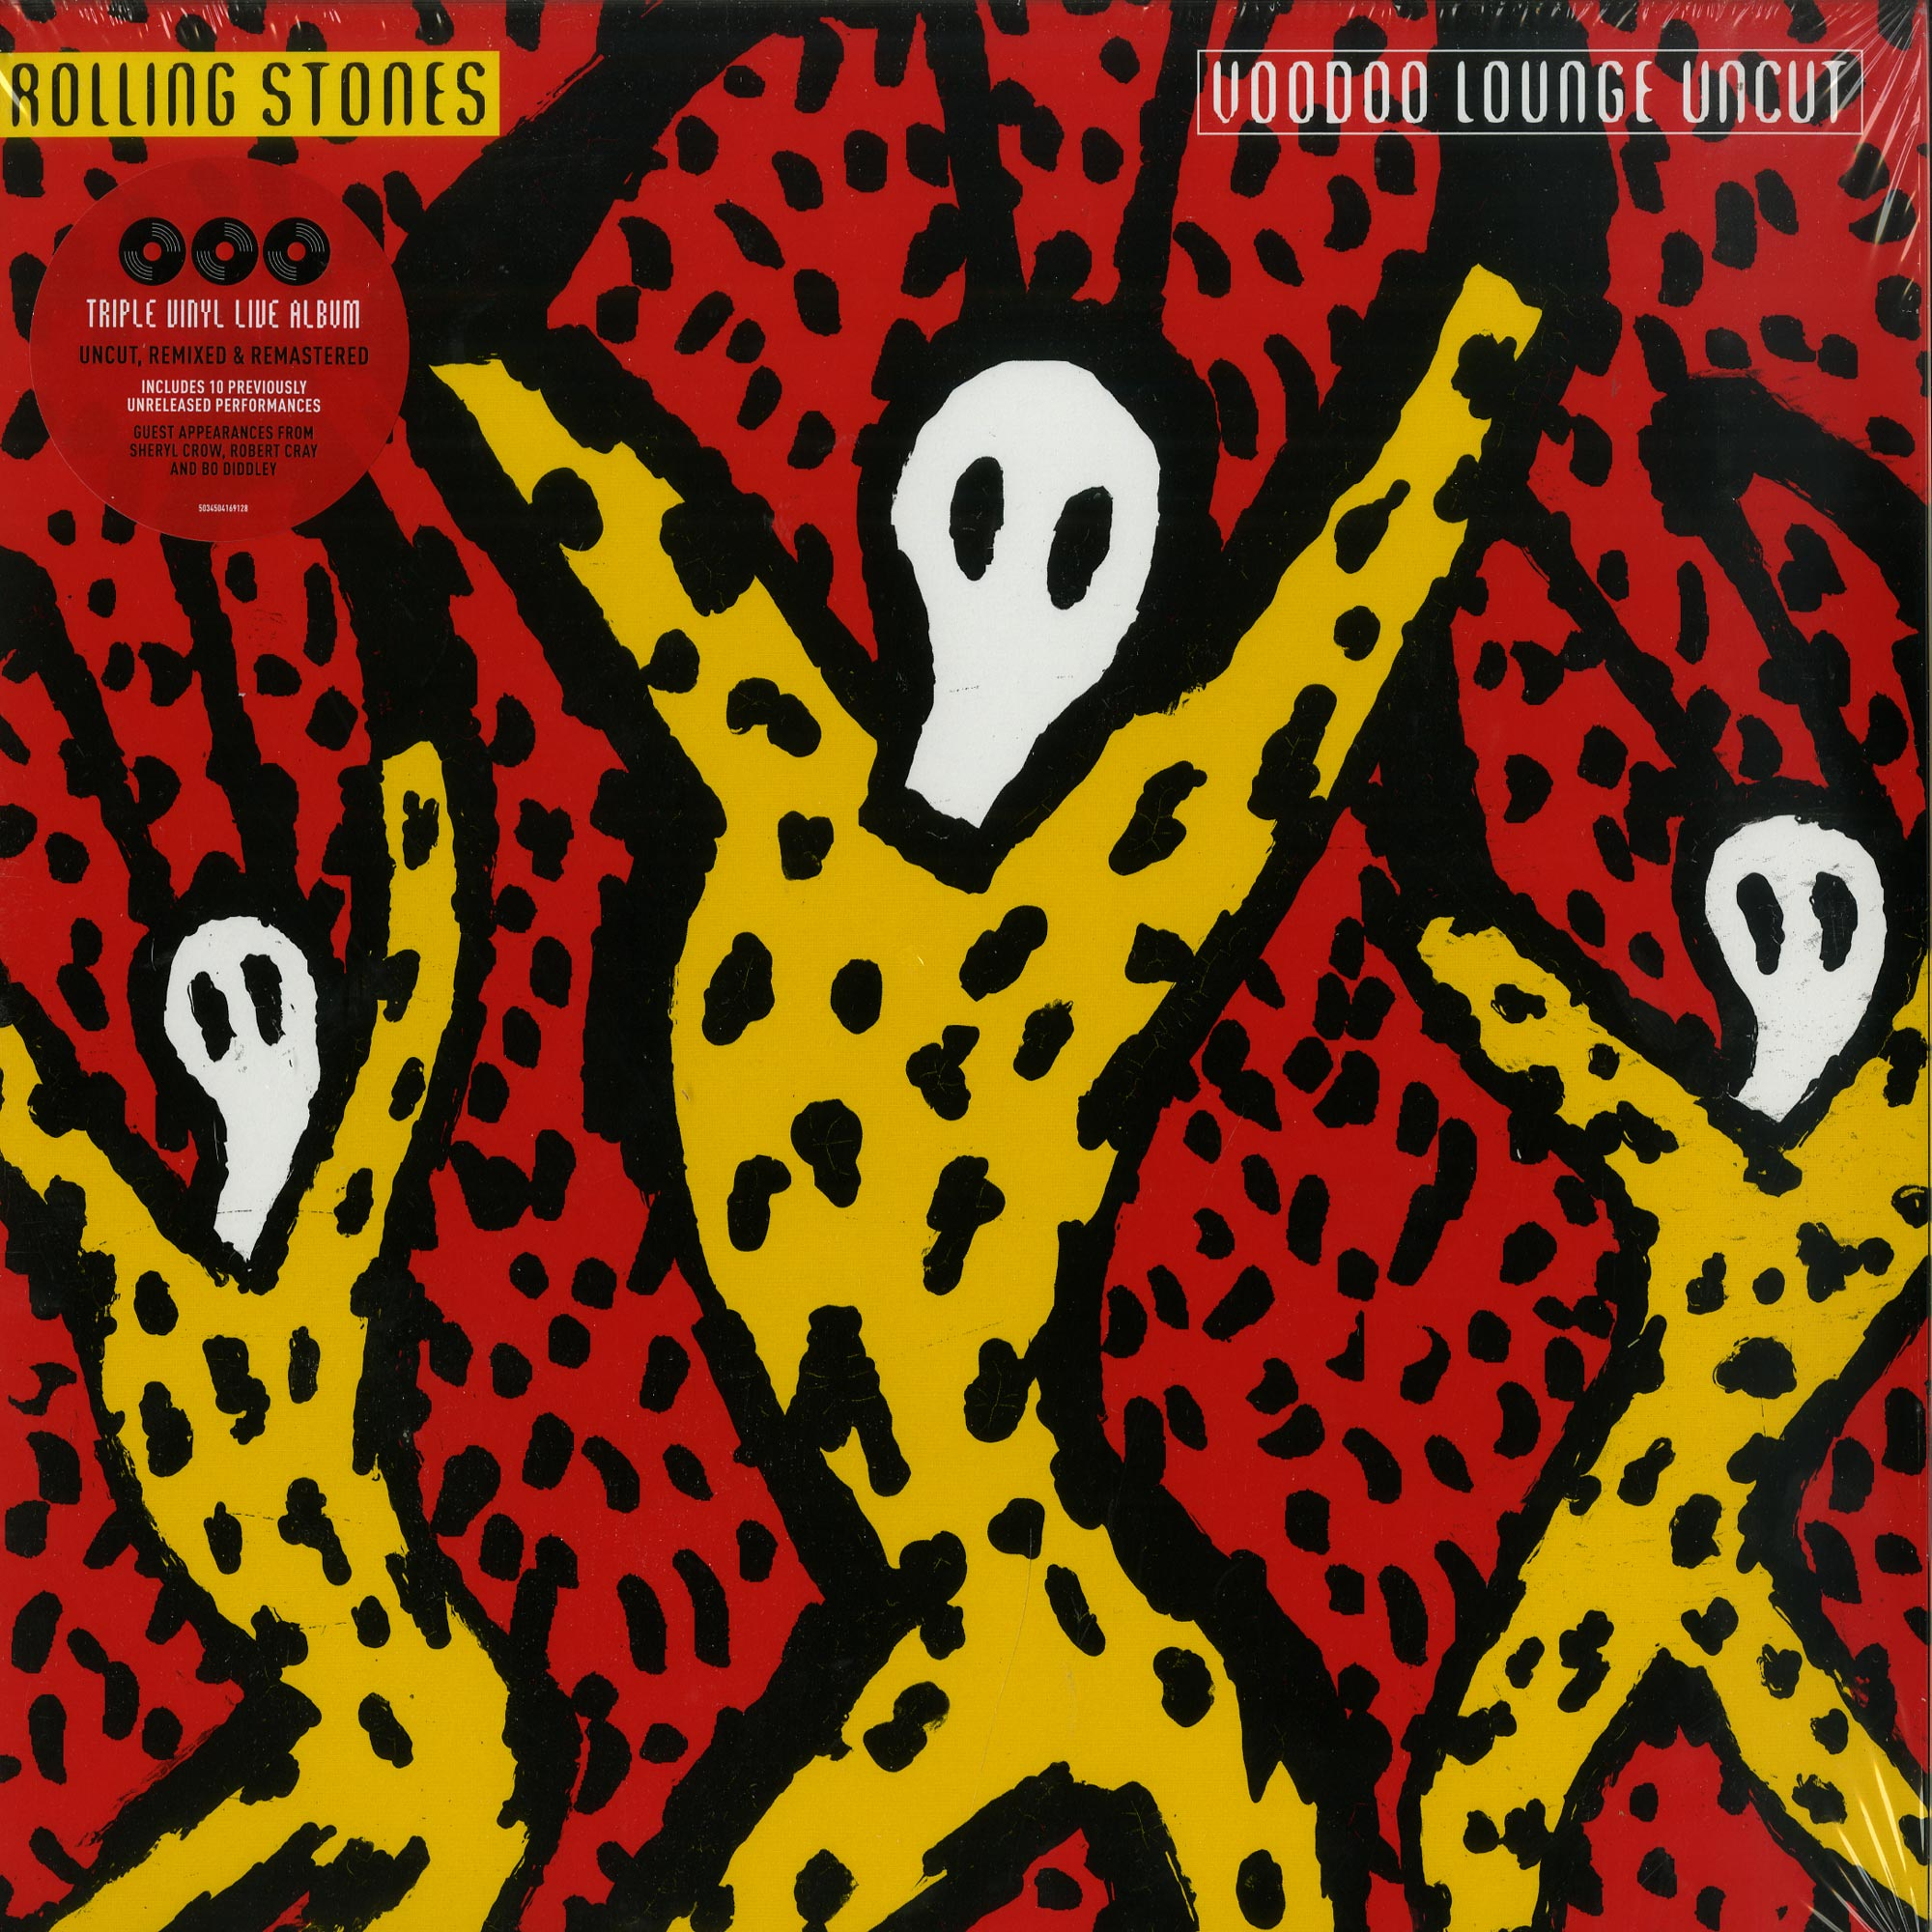 The Rolling Stones - VOODOO LOUNGE UNCUT